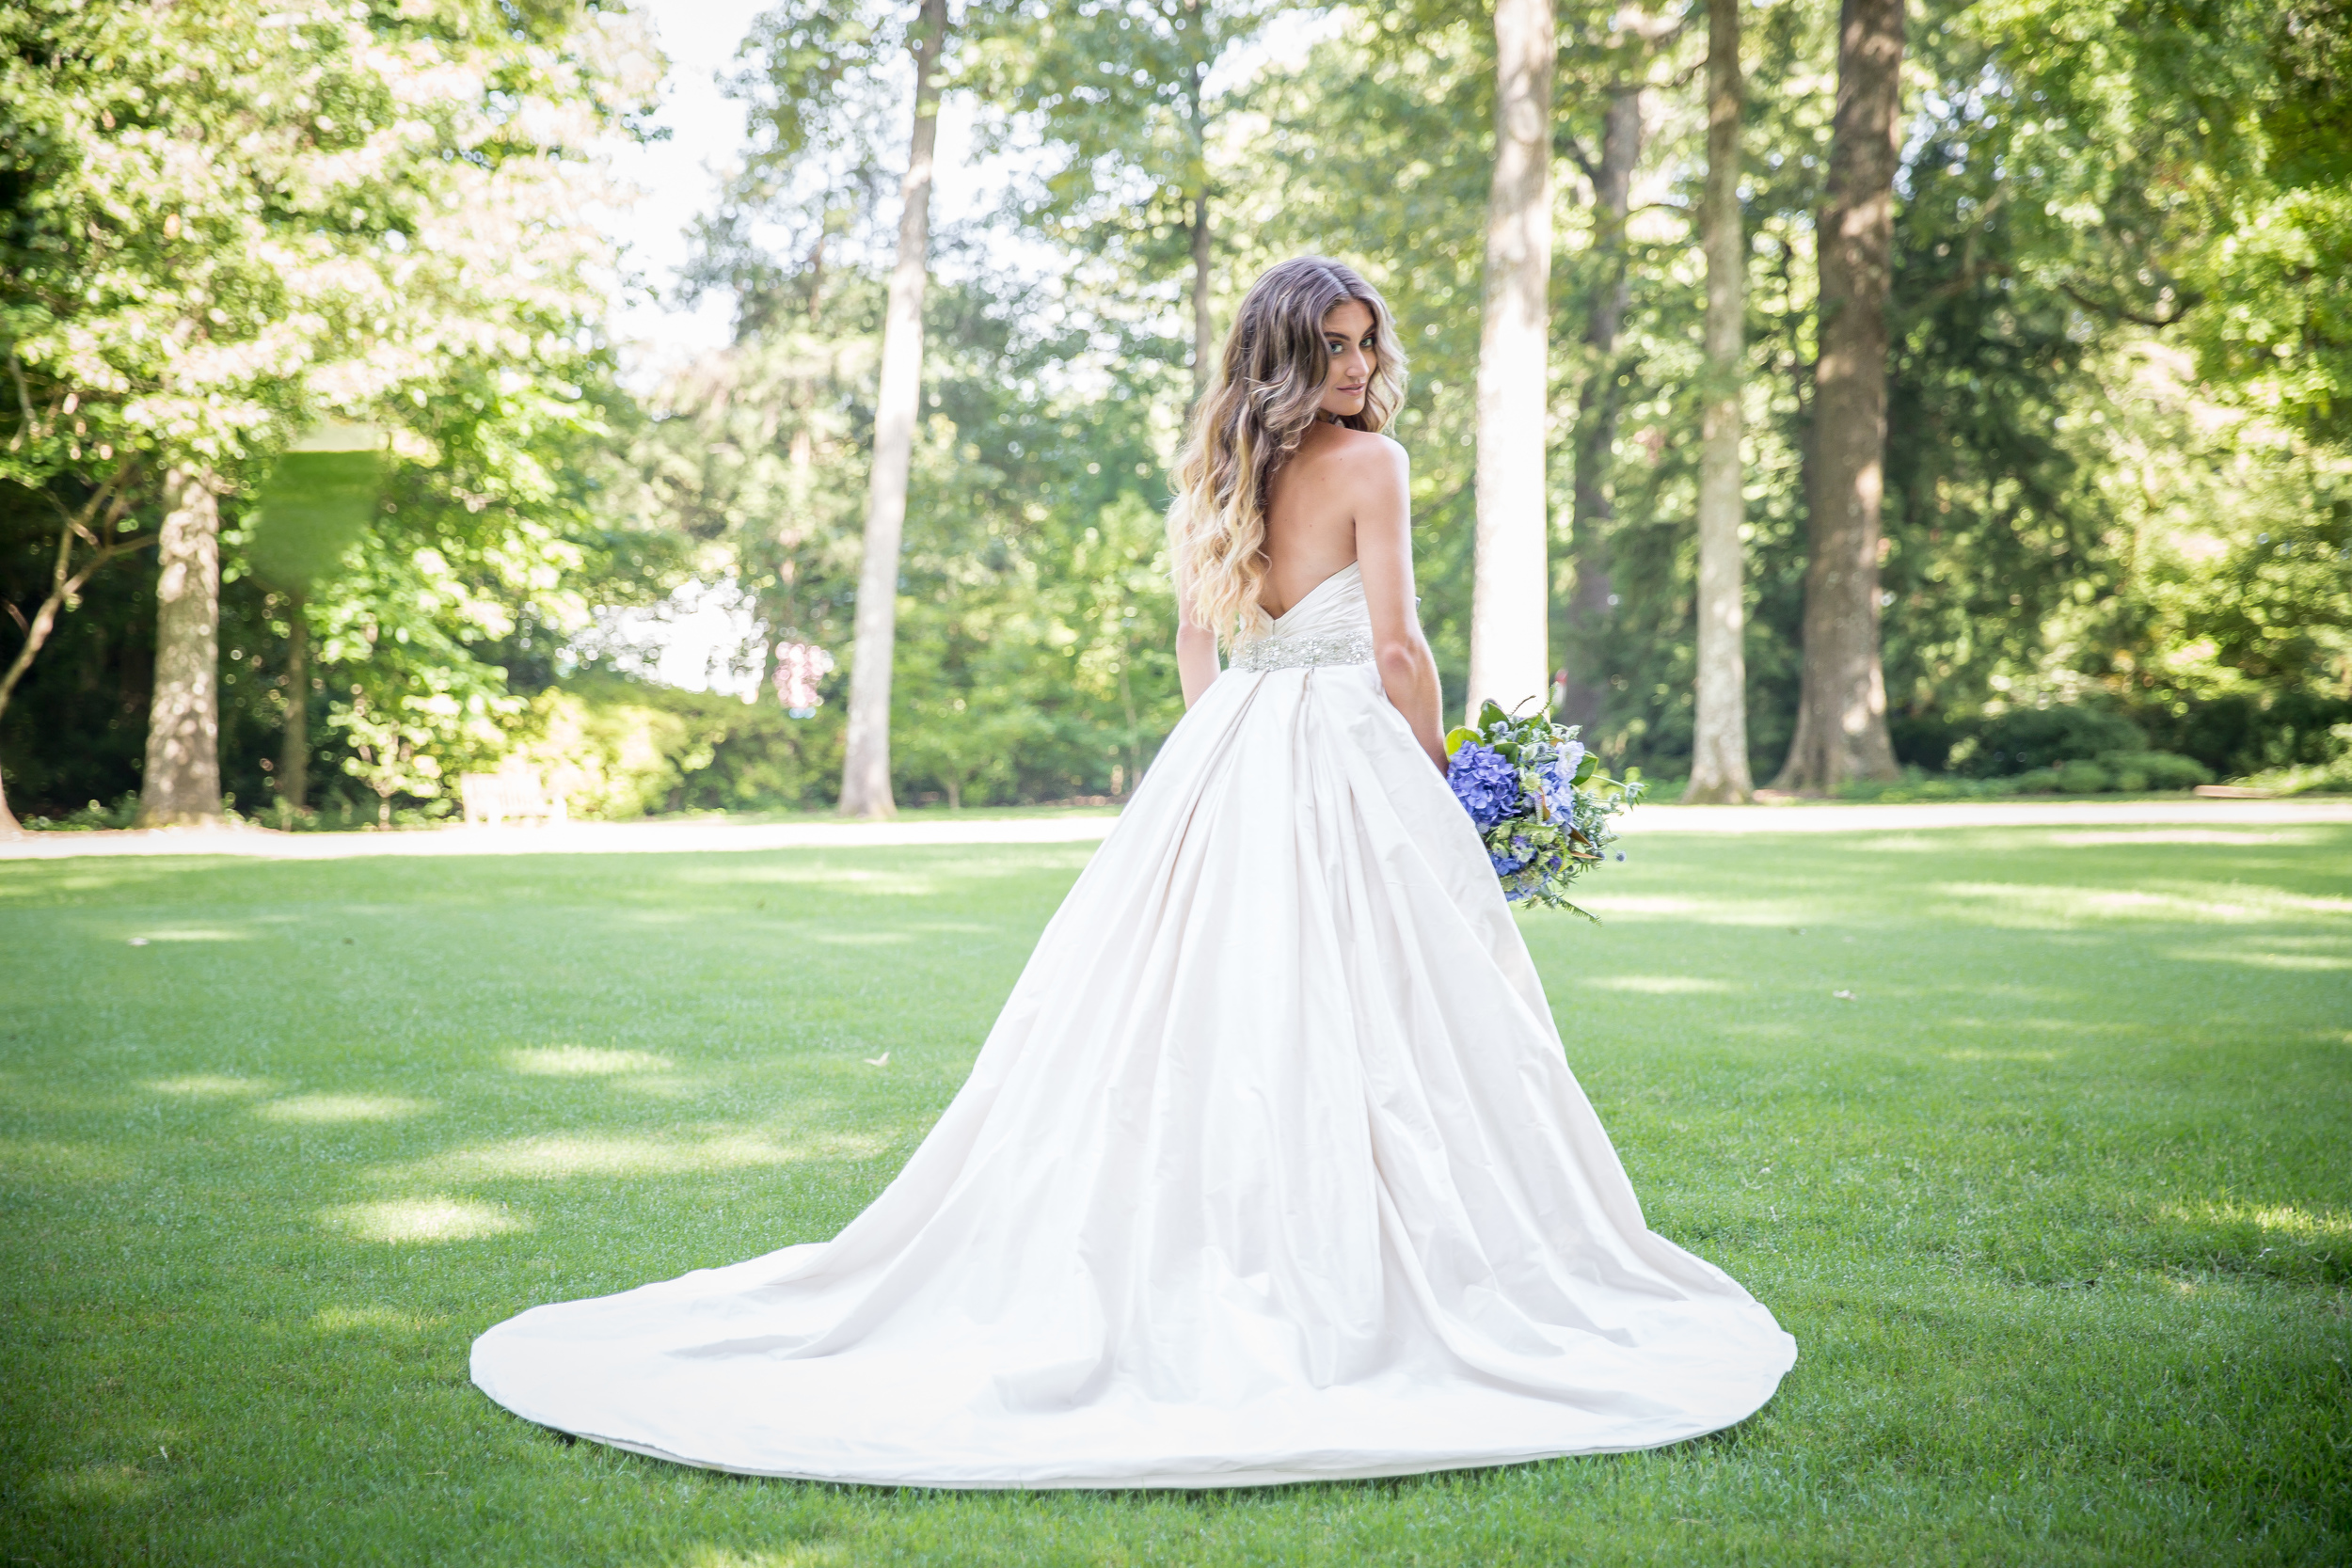 maggie louise bridal